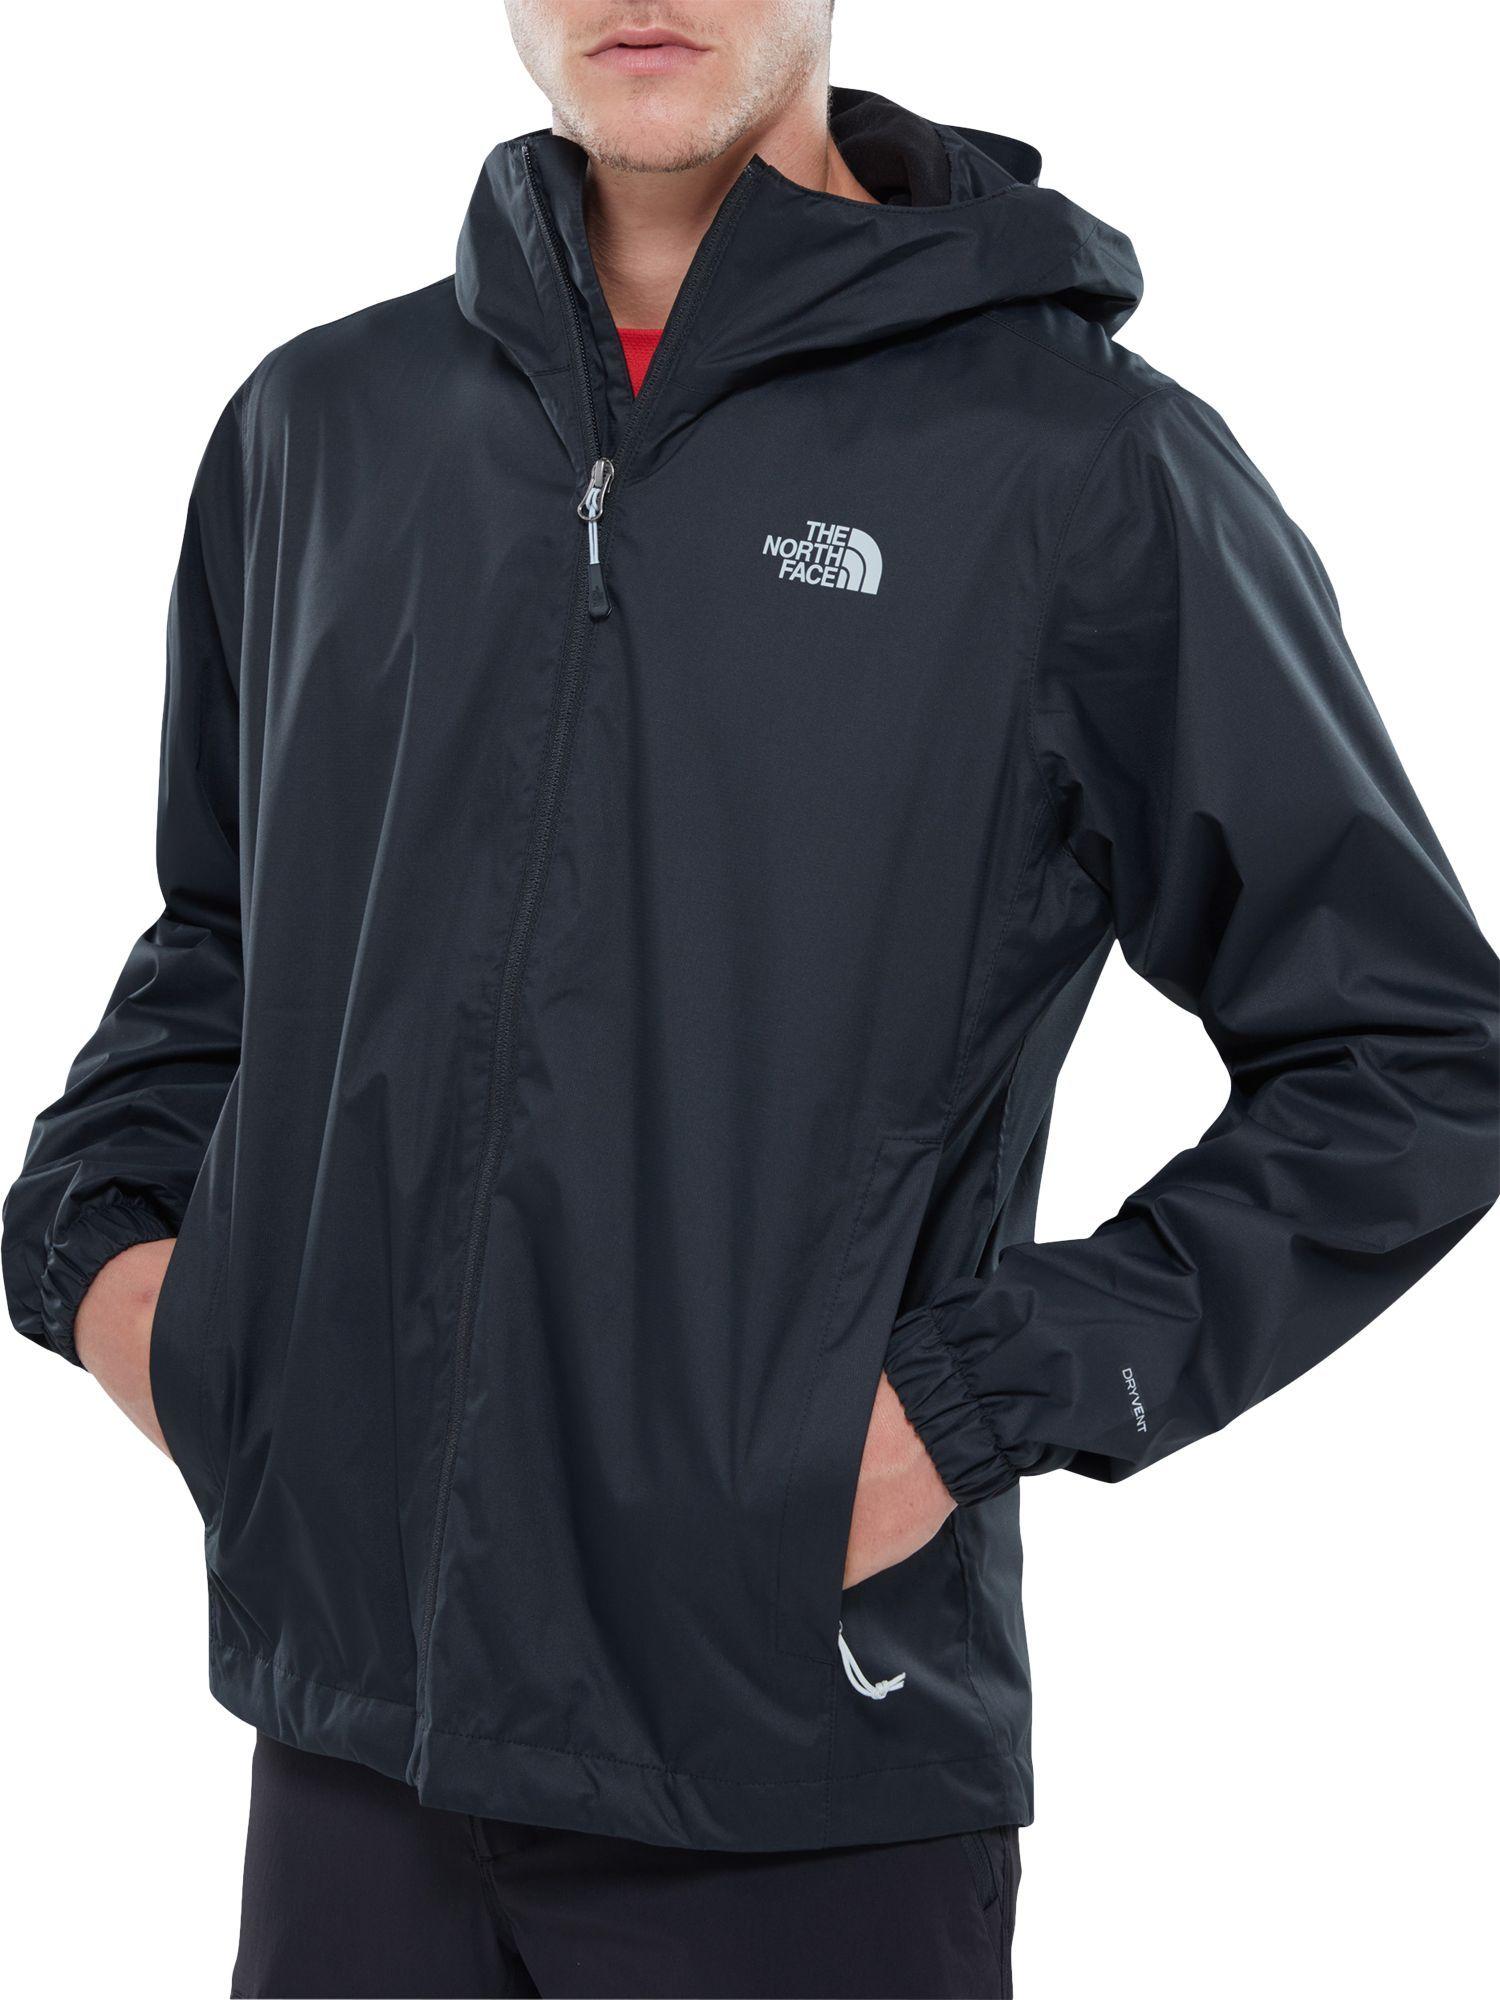 The North Face Quest Waterproof Men S Jacket In 2020 Jackets Hooded Jacket The North Face